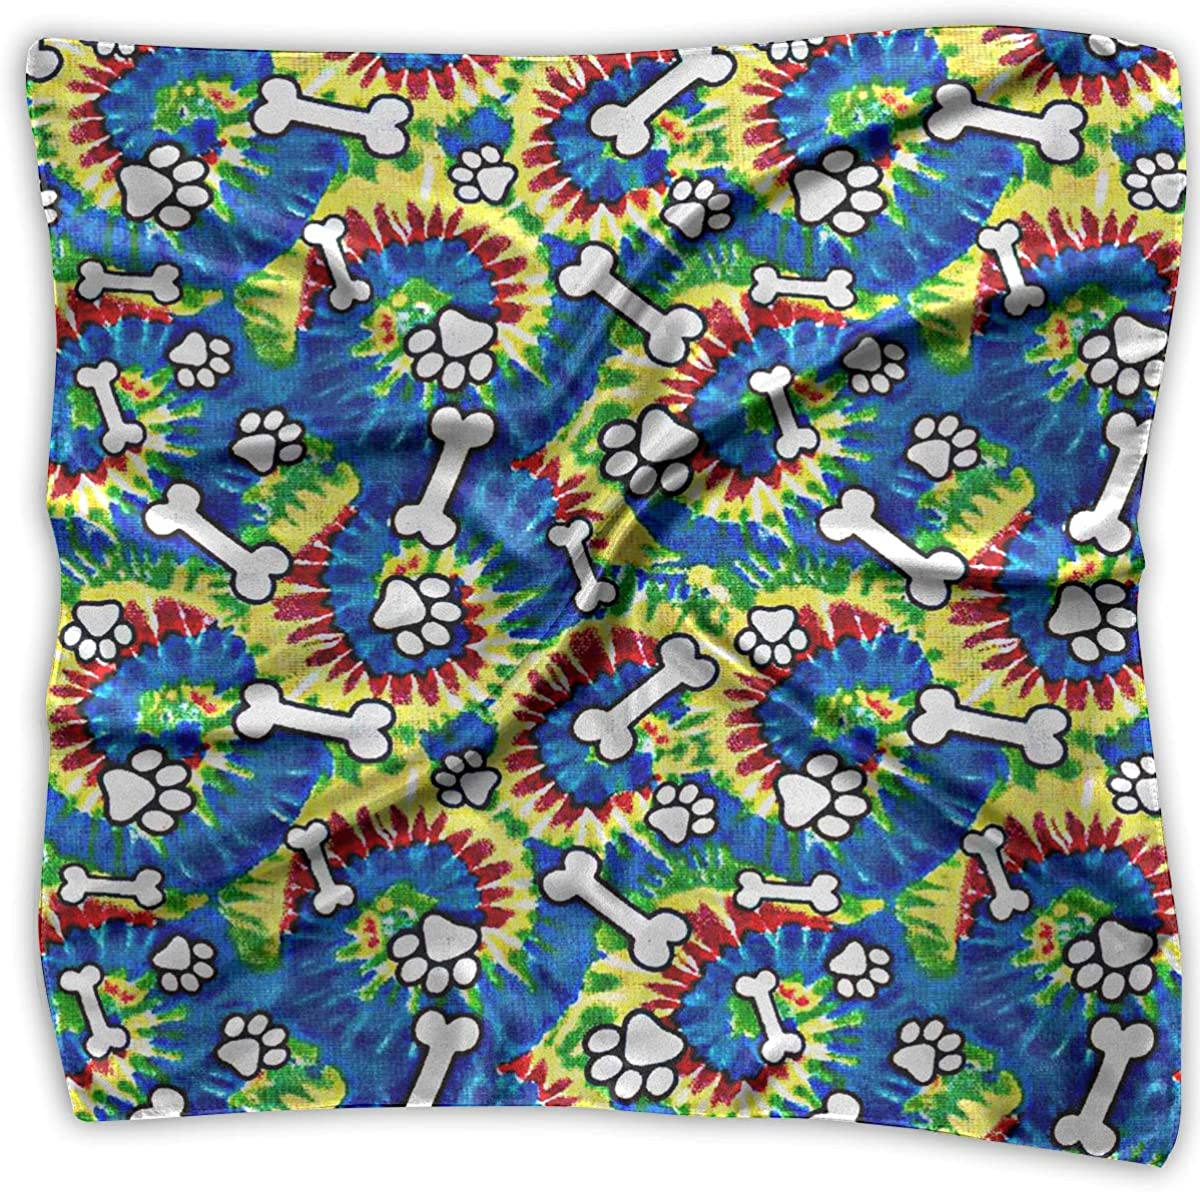 Womens Classic Handkerchiefs Tie Dye Paws /& Bones Square Silk Party Handkerchiefs